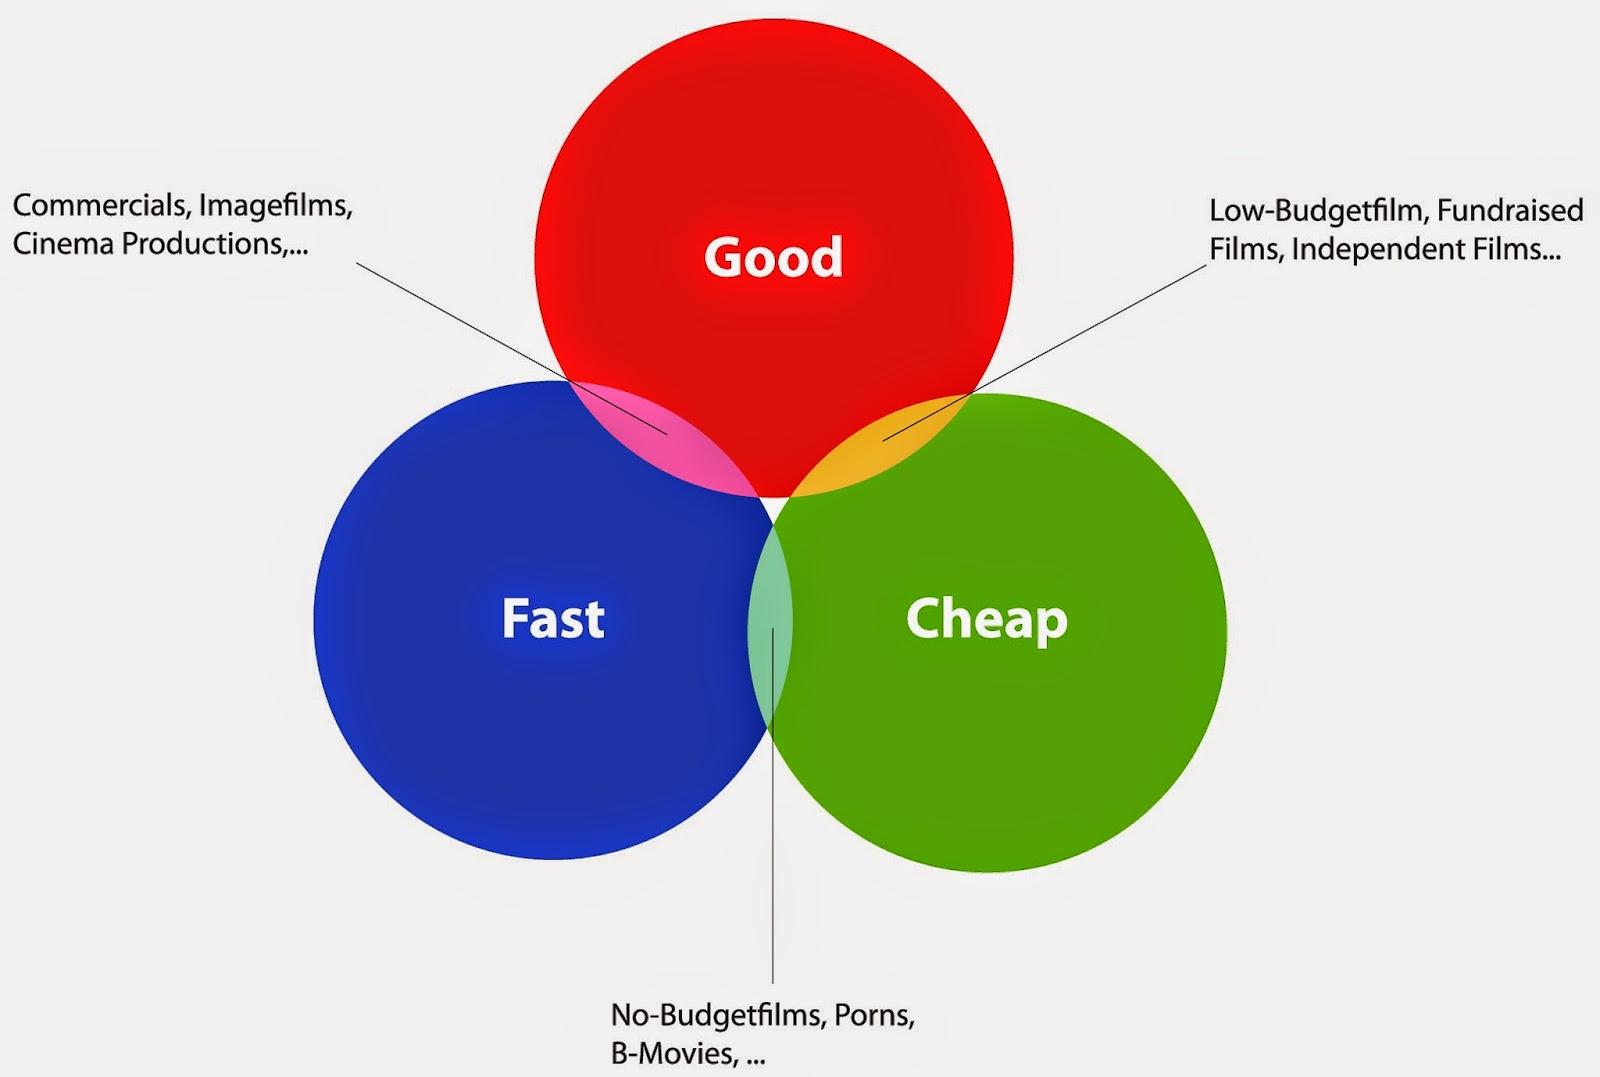 Where To Buy Cheap Model Get Cheap Transparent Bra  : FastCheapGood from sherlockdesigner.com size 1600 x 1077 jpeg 98kB